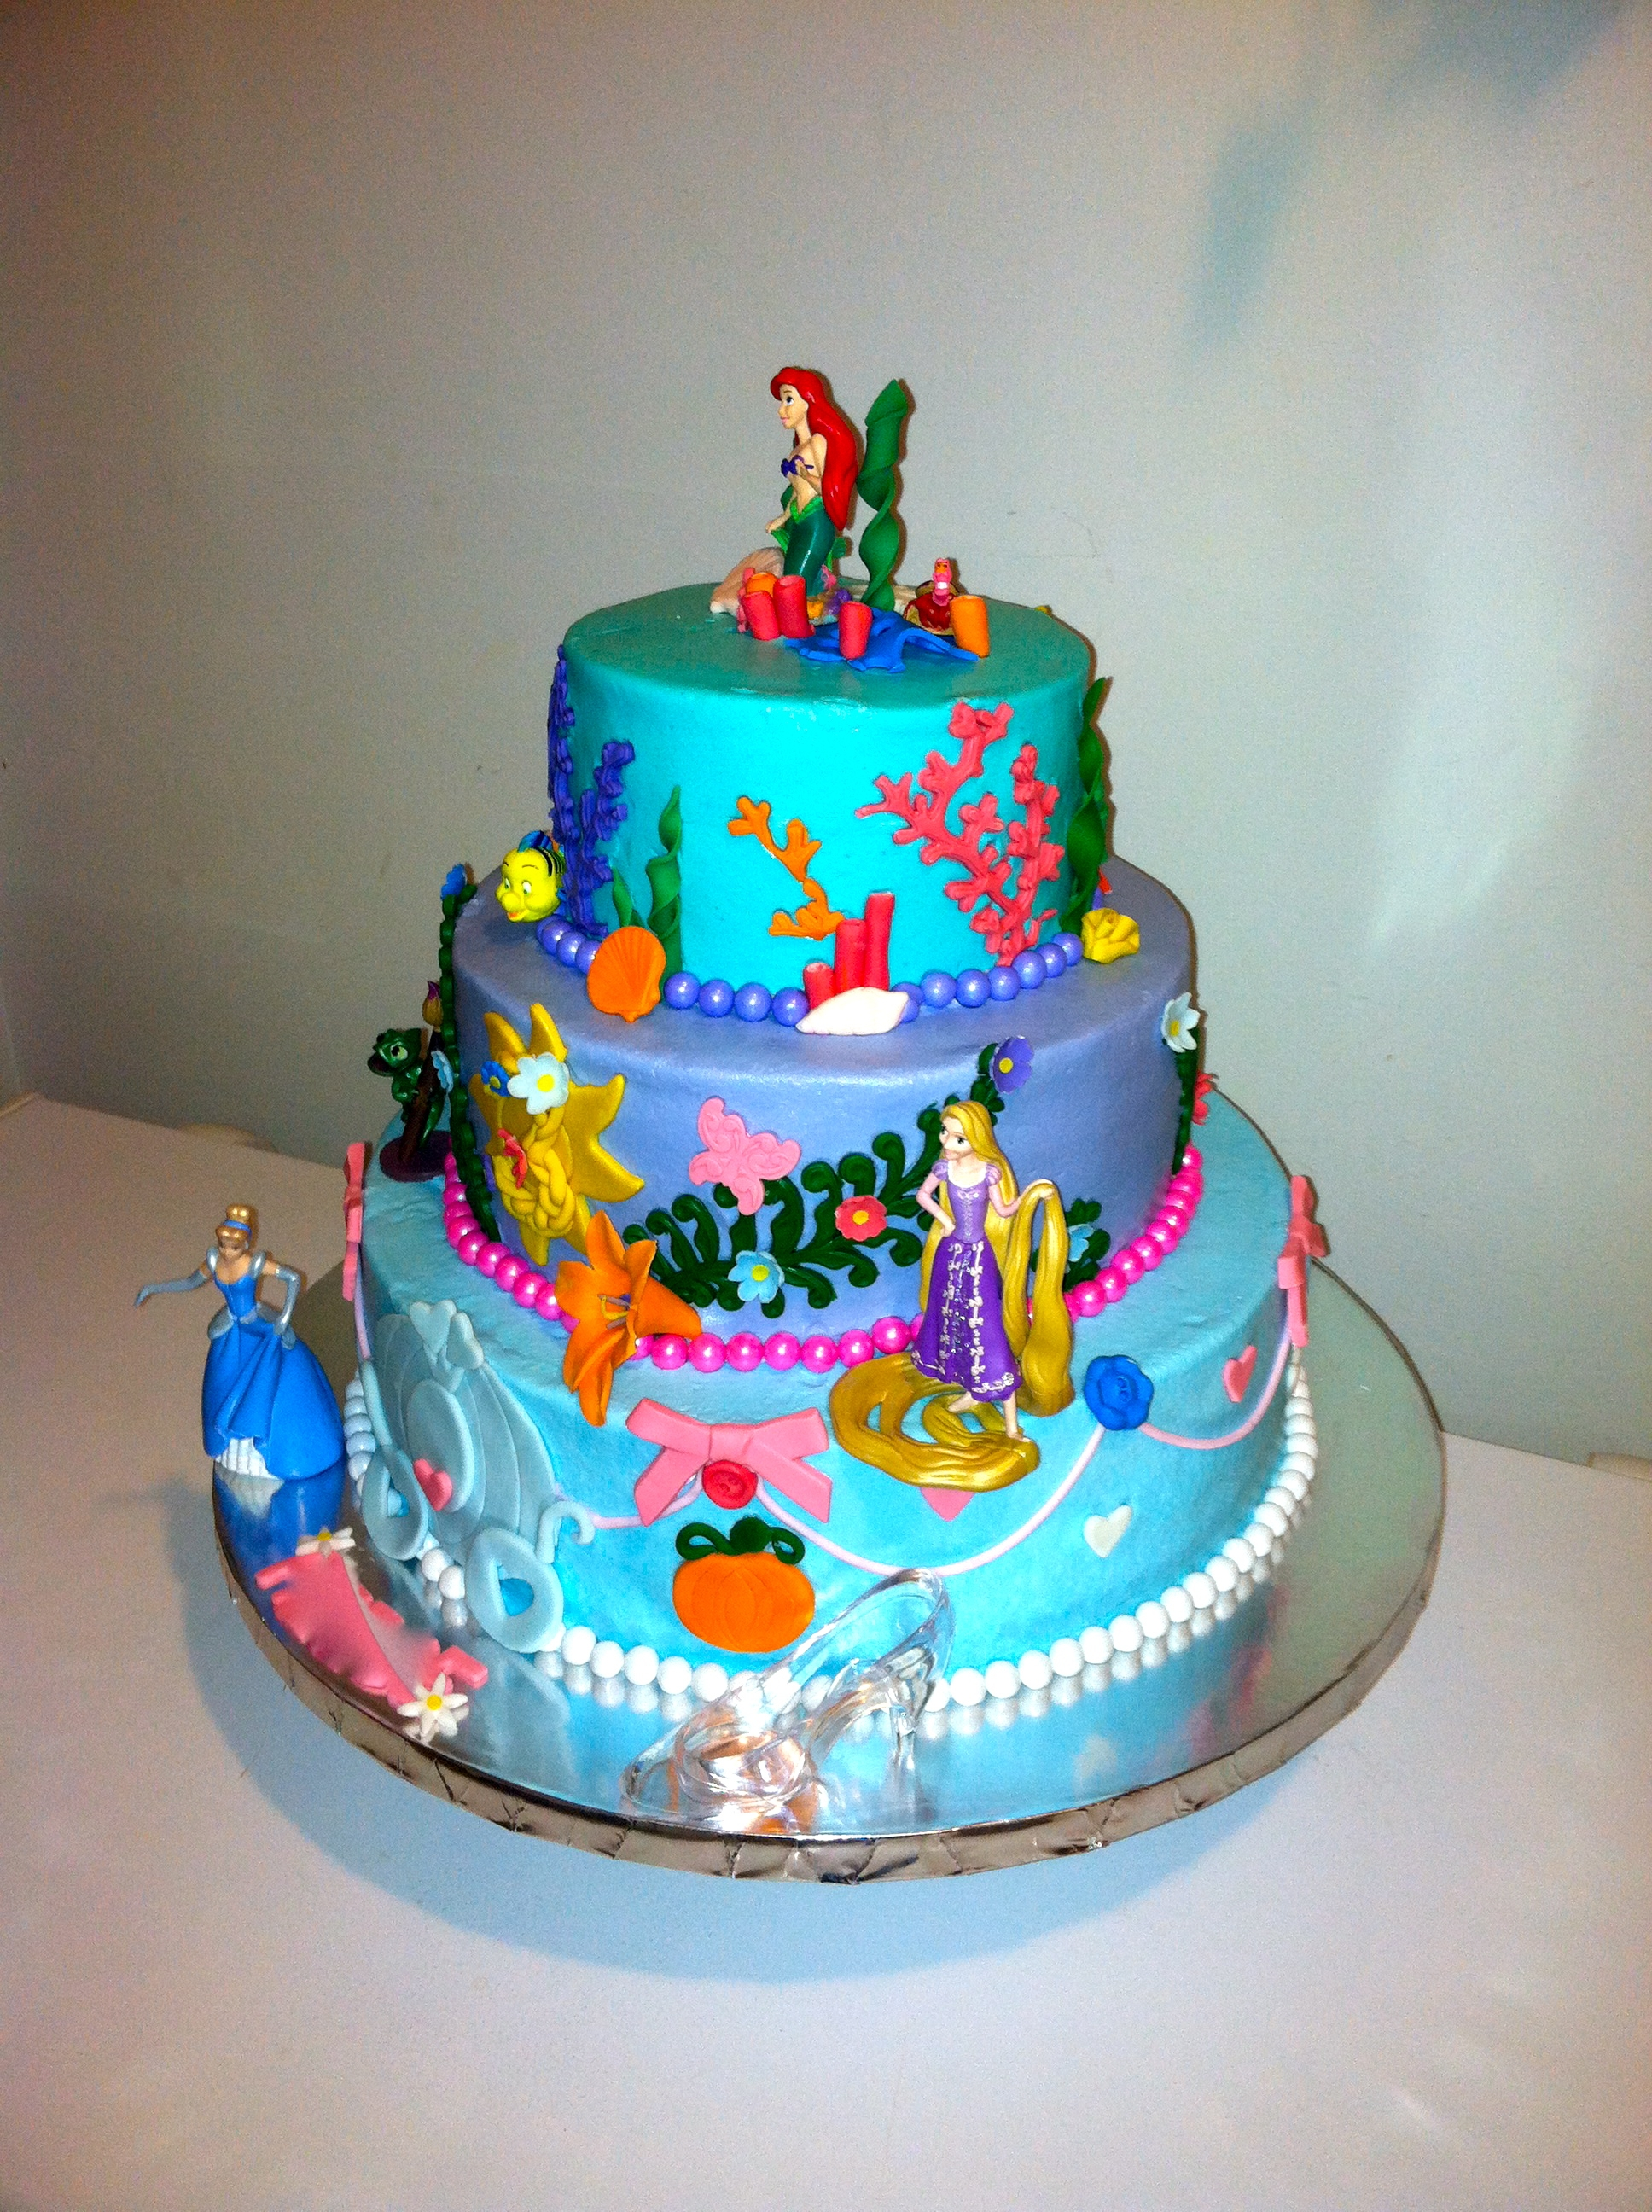 Cake Decoration Disney : Disney Princess Cake Arial Rapunzel And Cinderella Bc ...